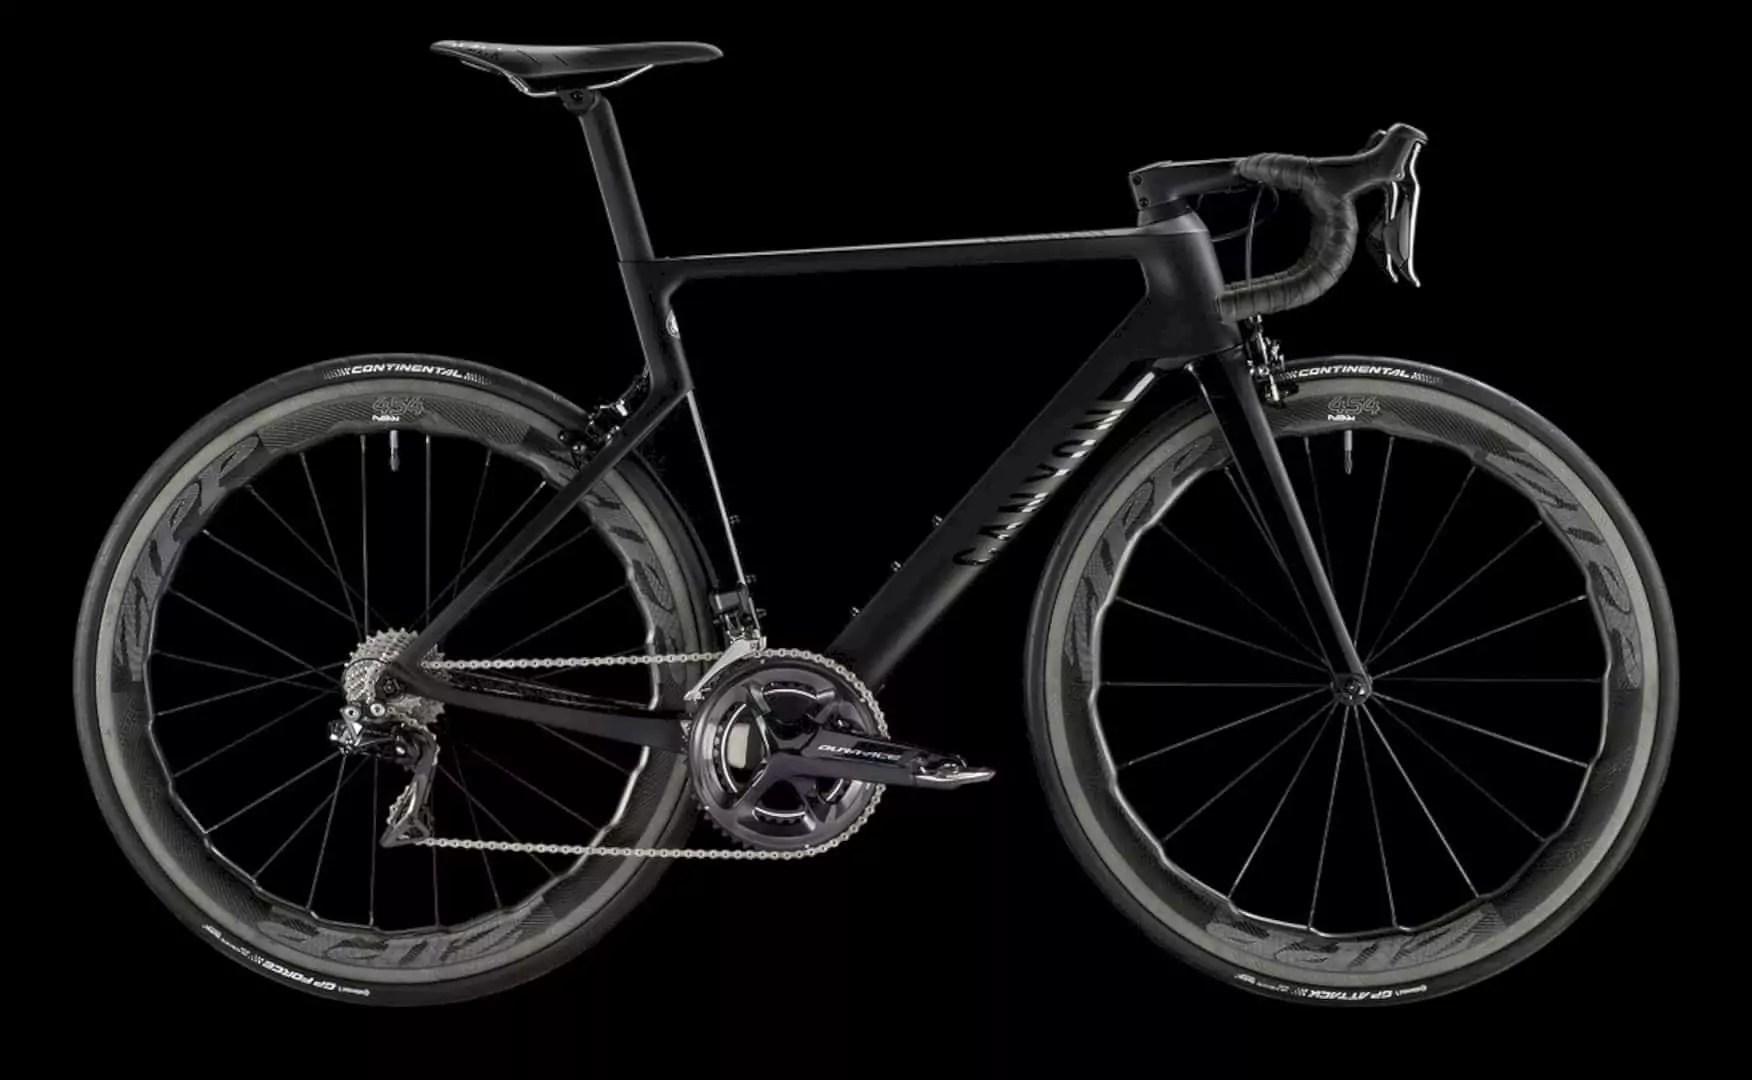 Aeroad CF SLX 9.0 LTD: Comfortable and Reliable Bike